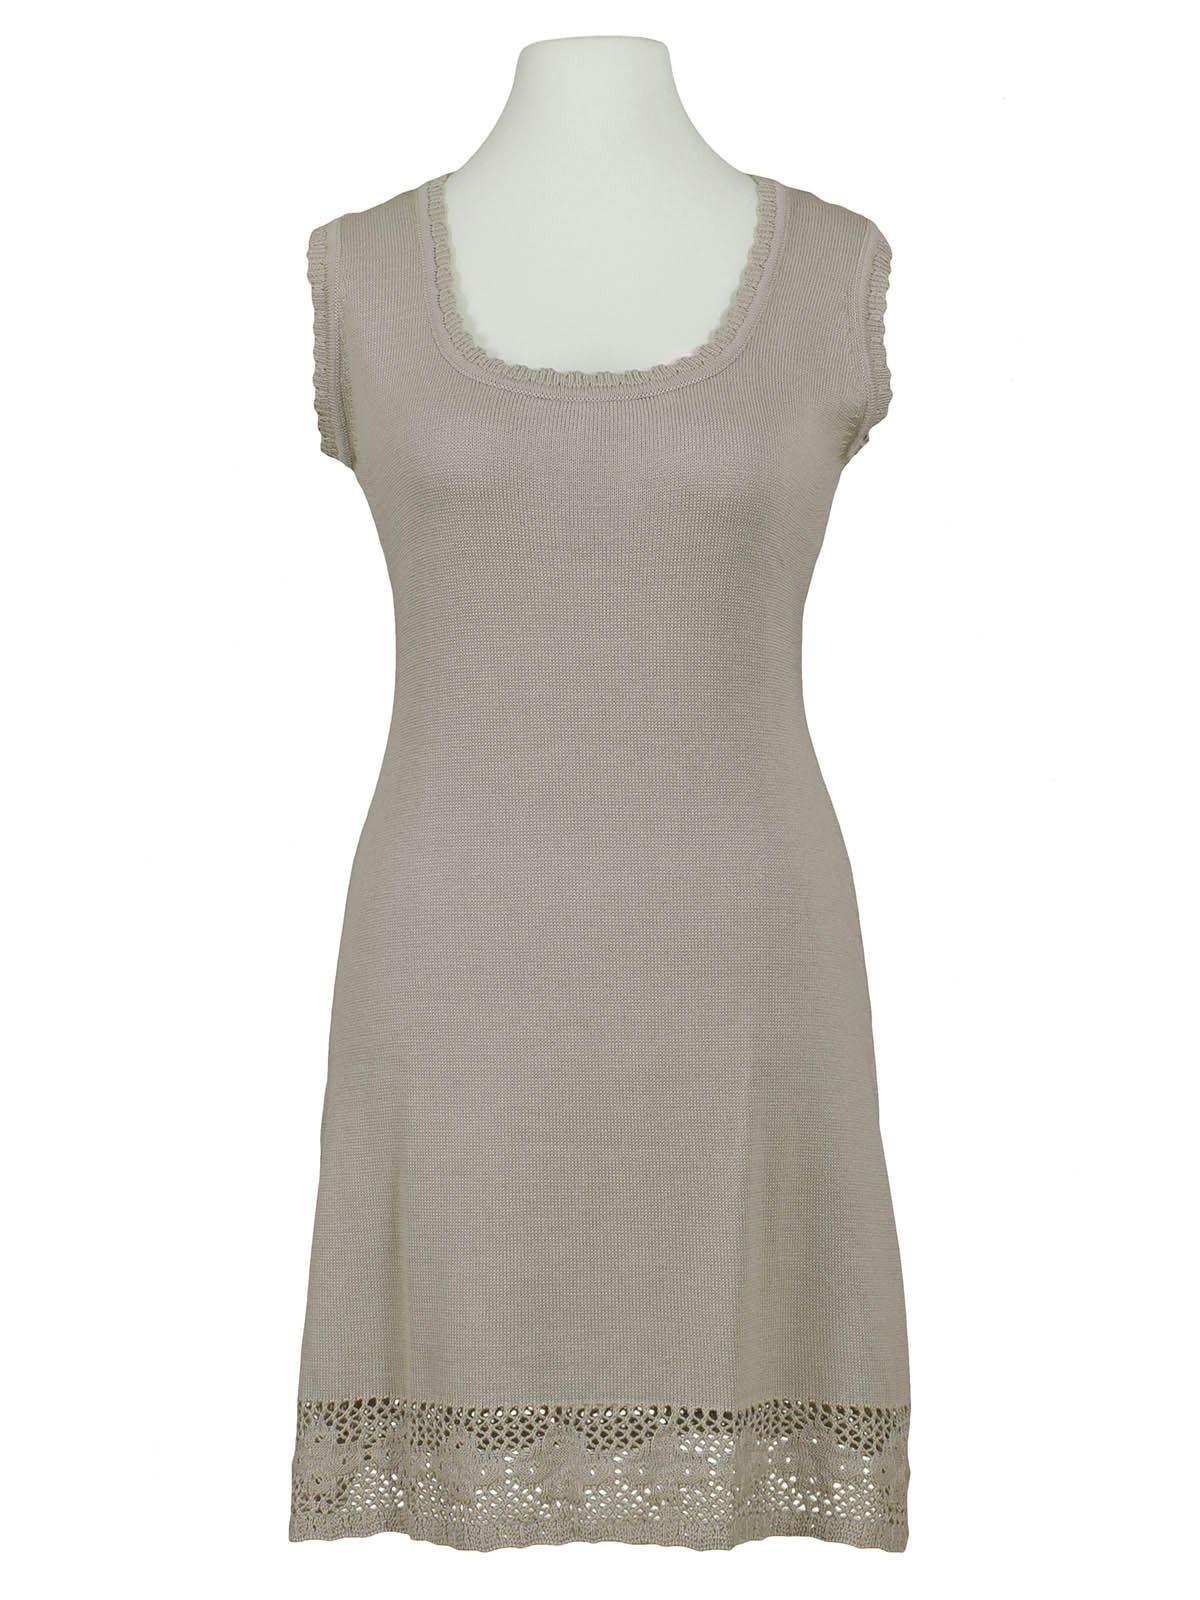 15 Top Kleid Spitze Boutique Genial Kleid Spitze Stylish